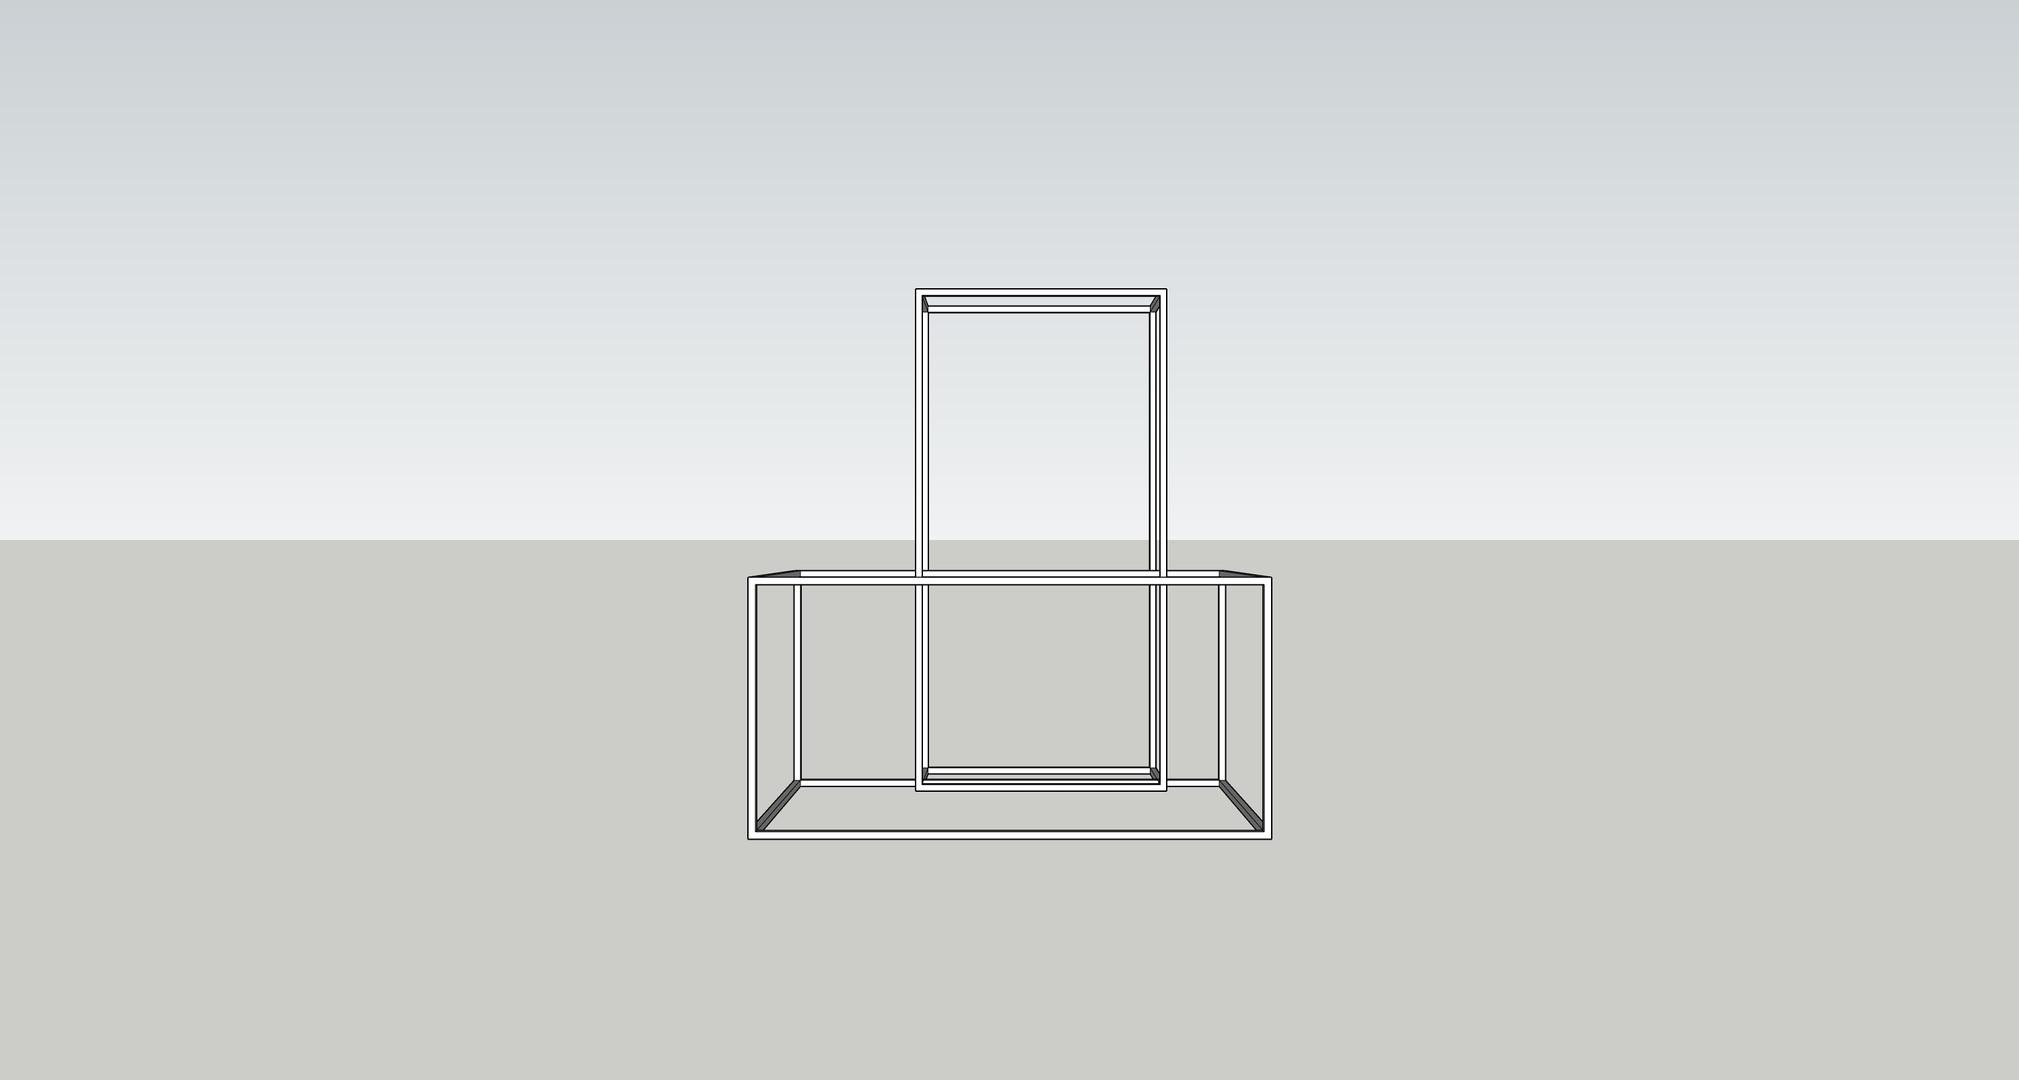 Final piece_perspective 3.jpg